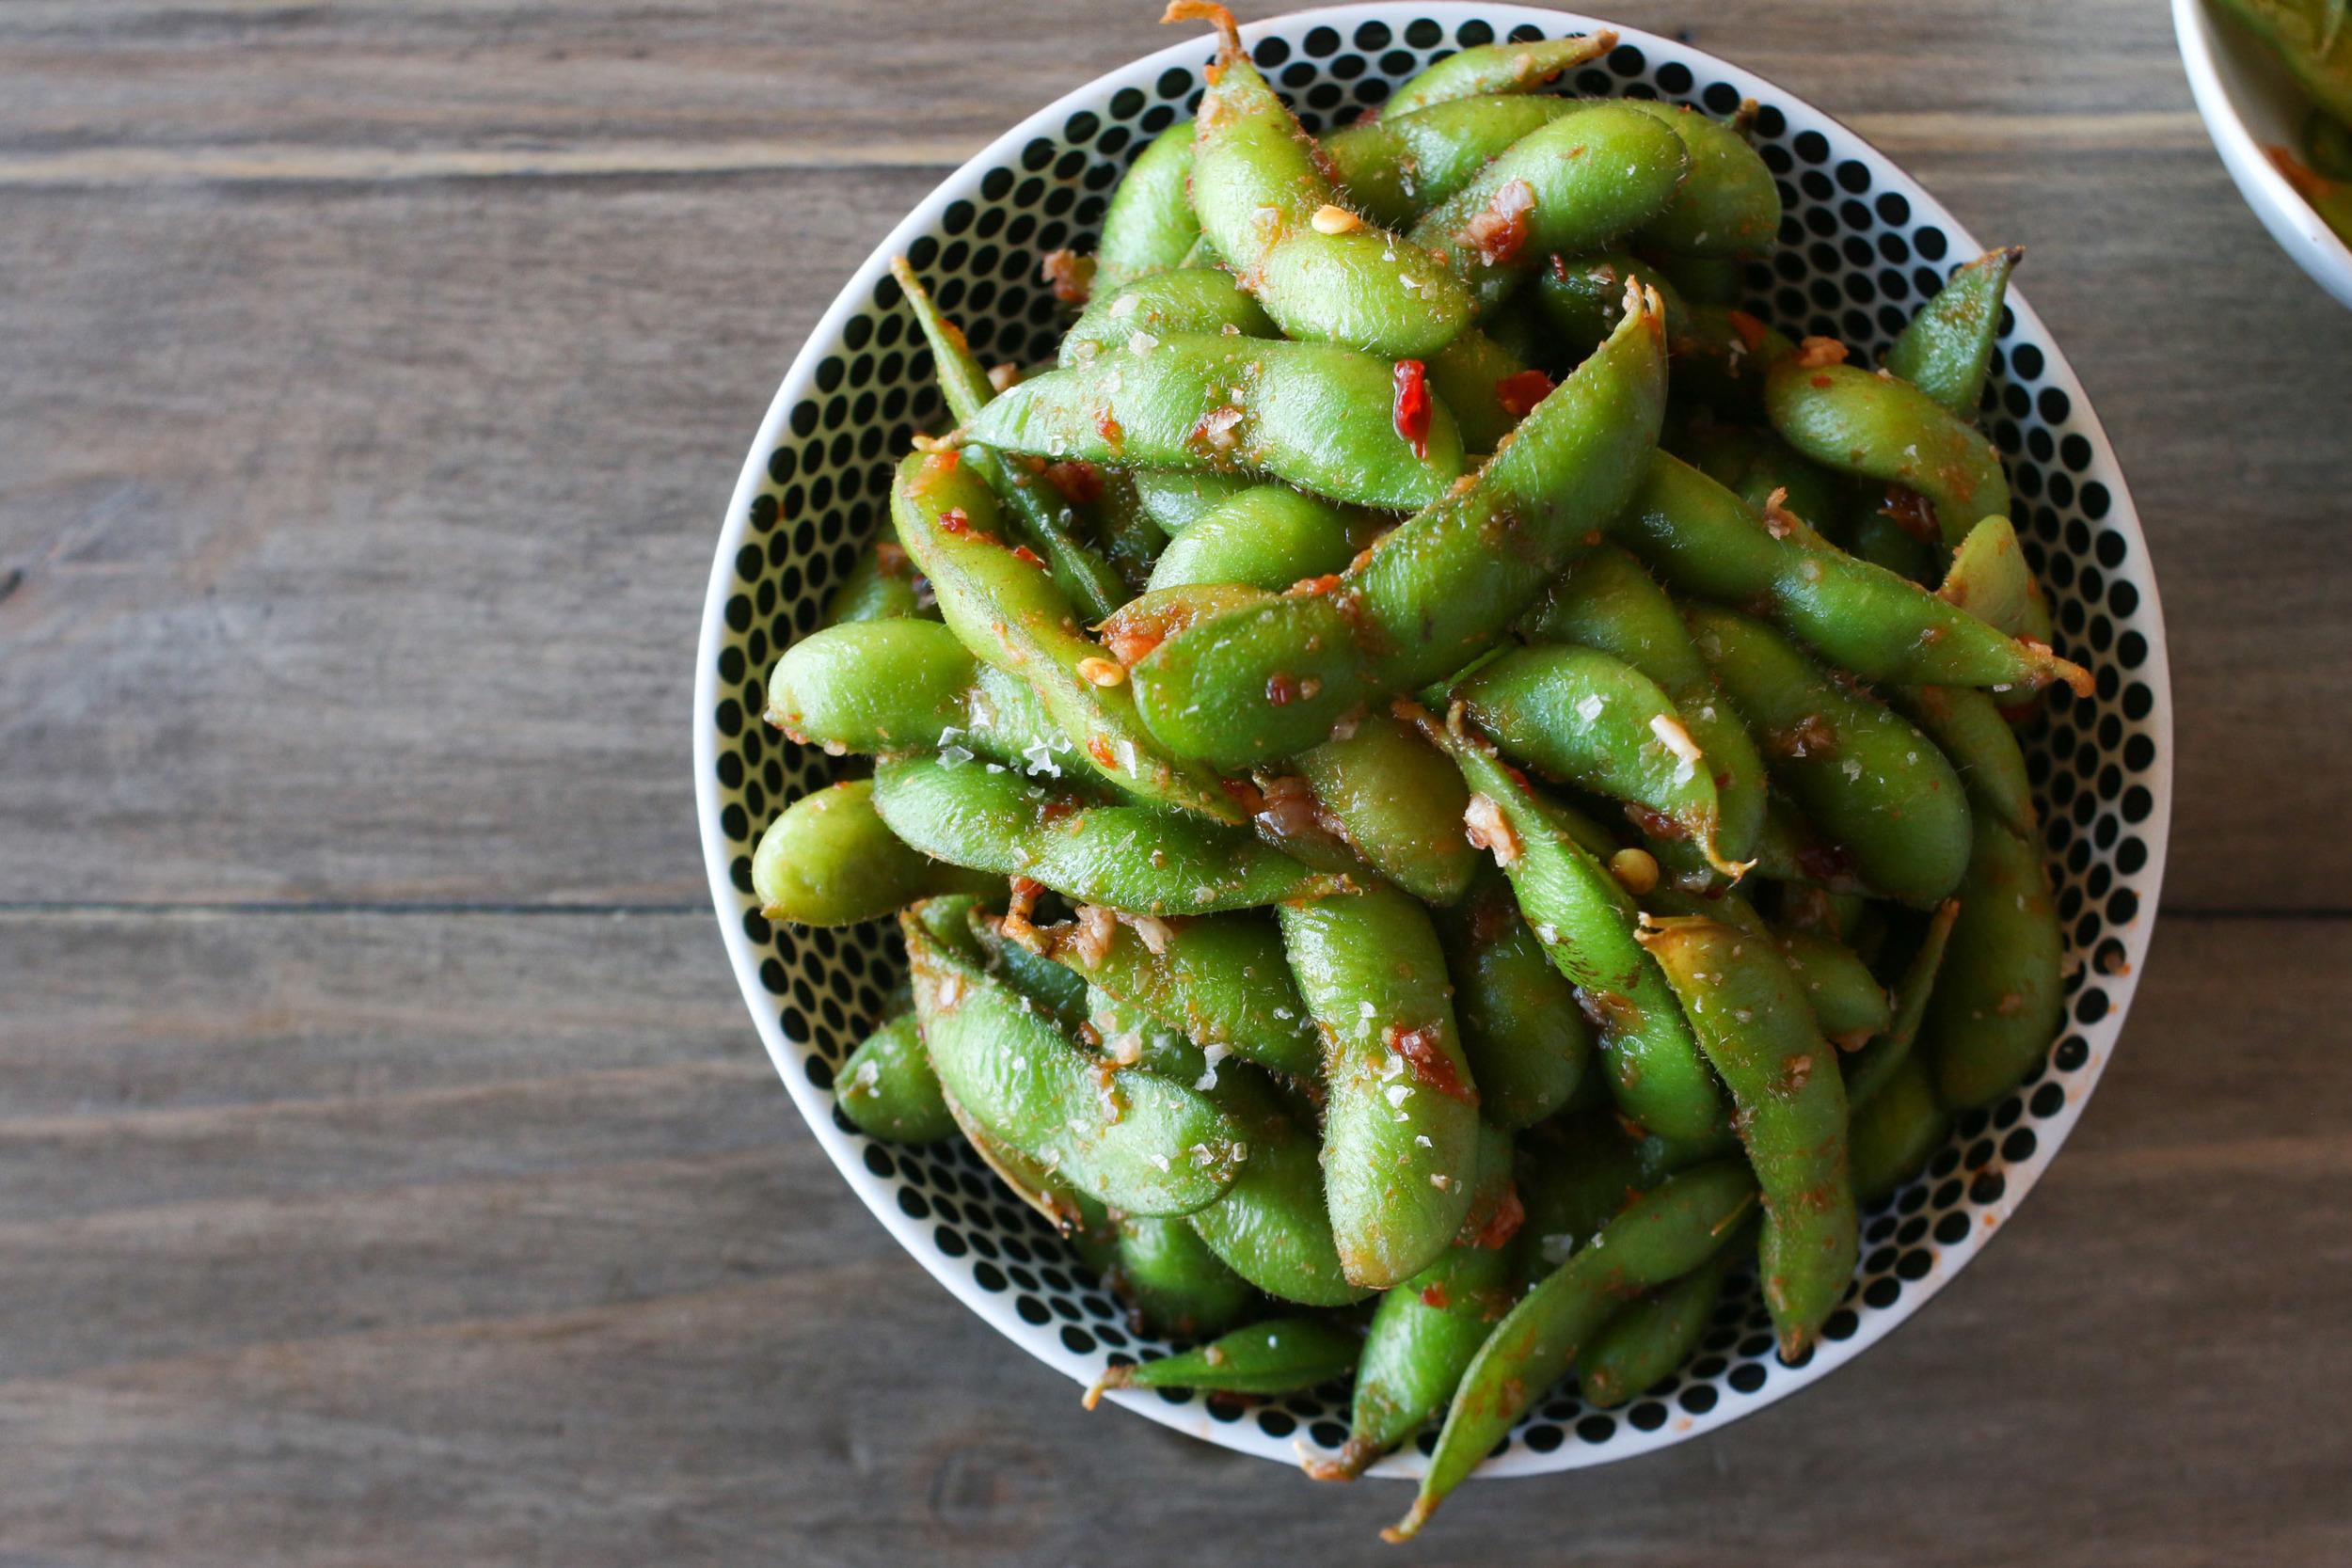 Chili Garlic Edamame Beans